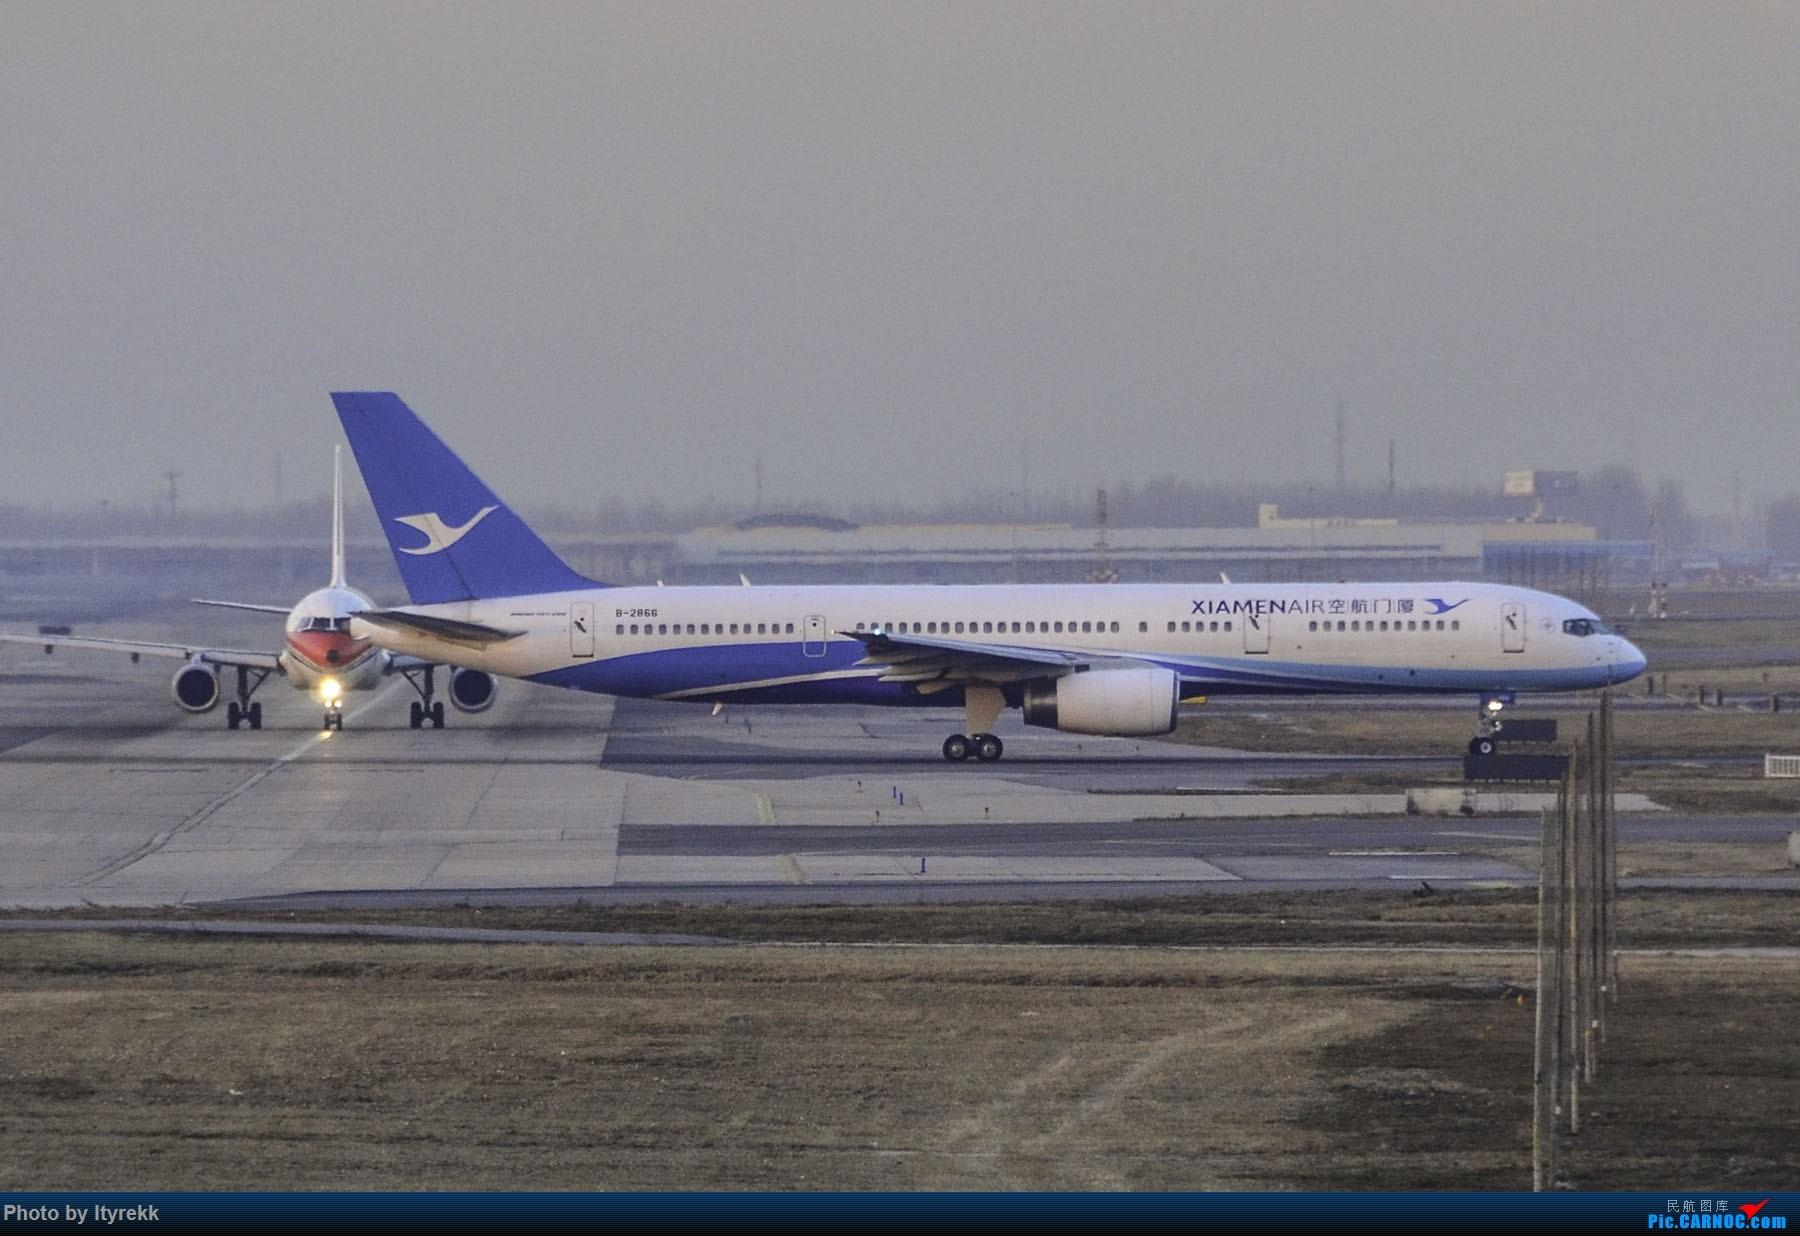 Re:[原创]PEK一日游 收获厦航首架789 B-1566等 BOEING 757-200 B-2866 中国北京首都国际机场